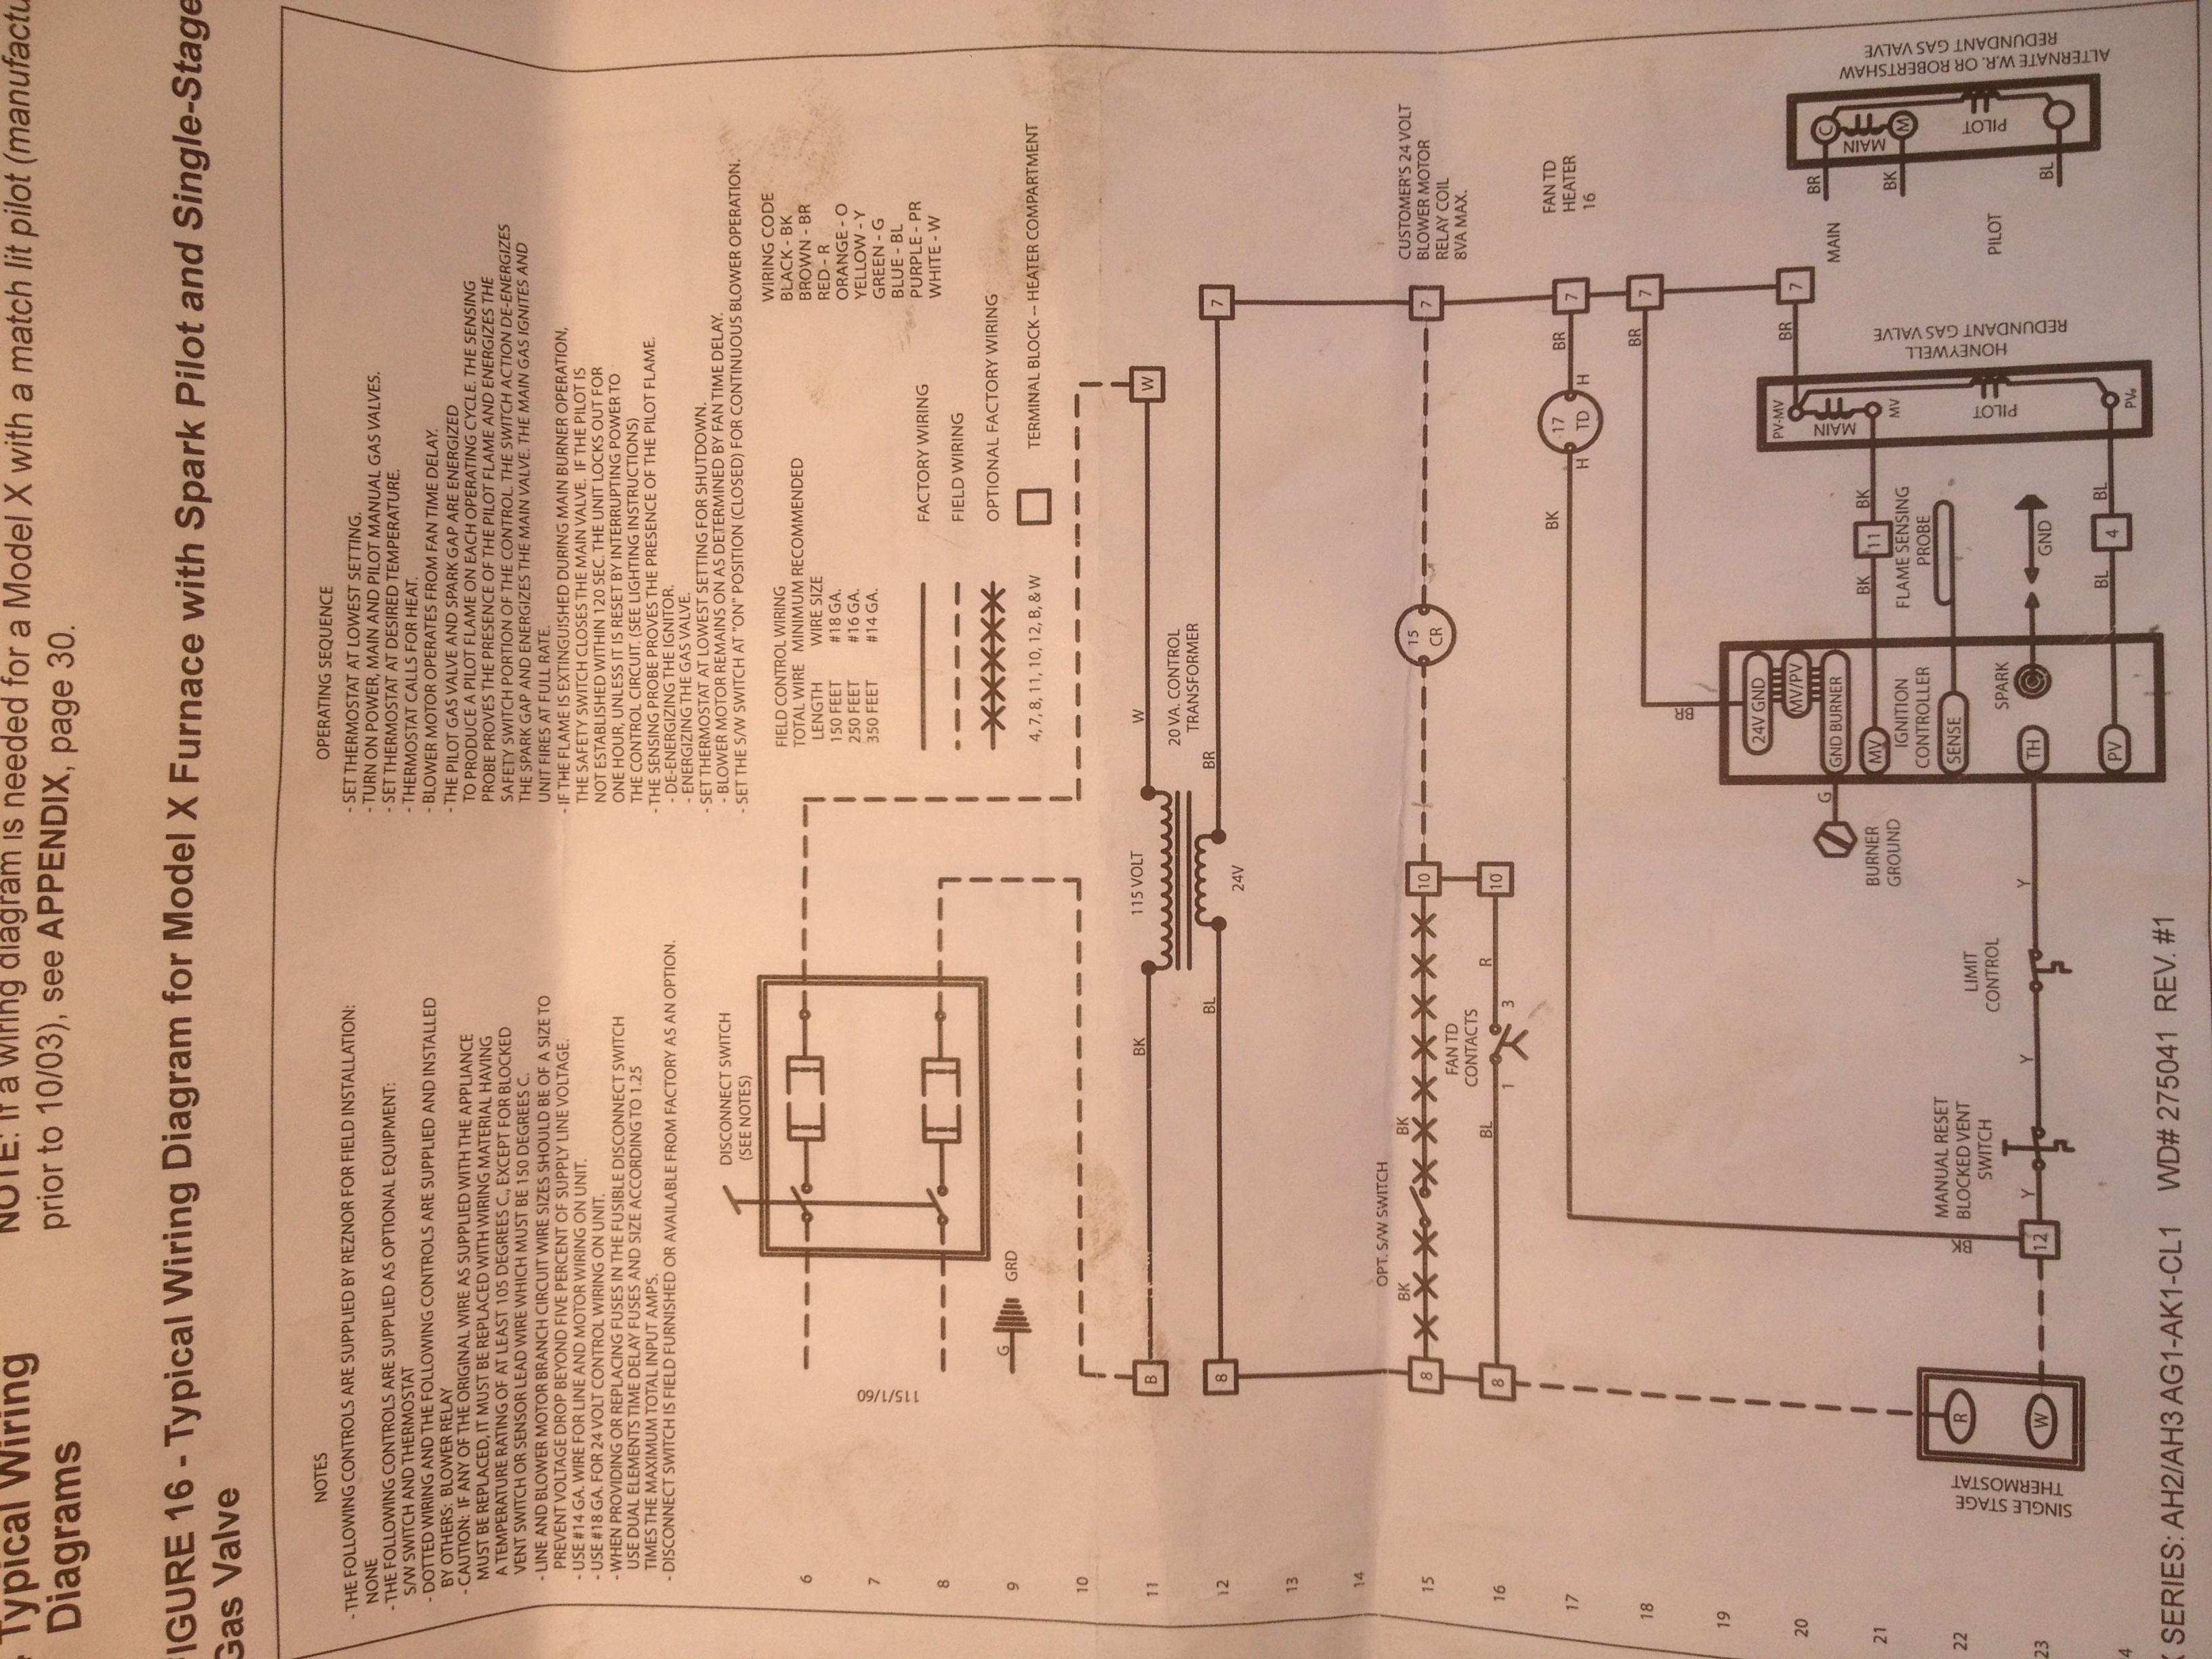 Reznor Gas Furnace Wiring - Wiring Diagrams Hubs - Reznor Heater Wiring Diagram